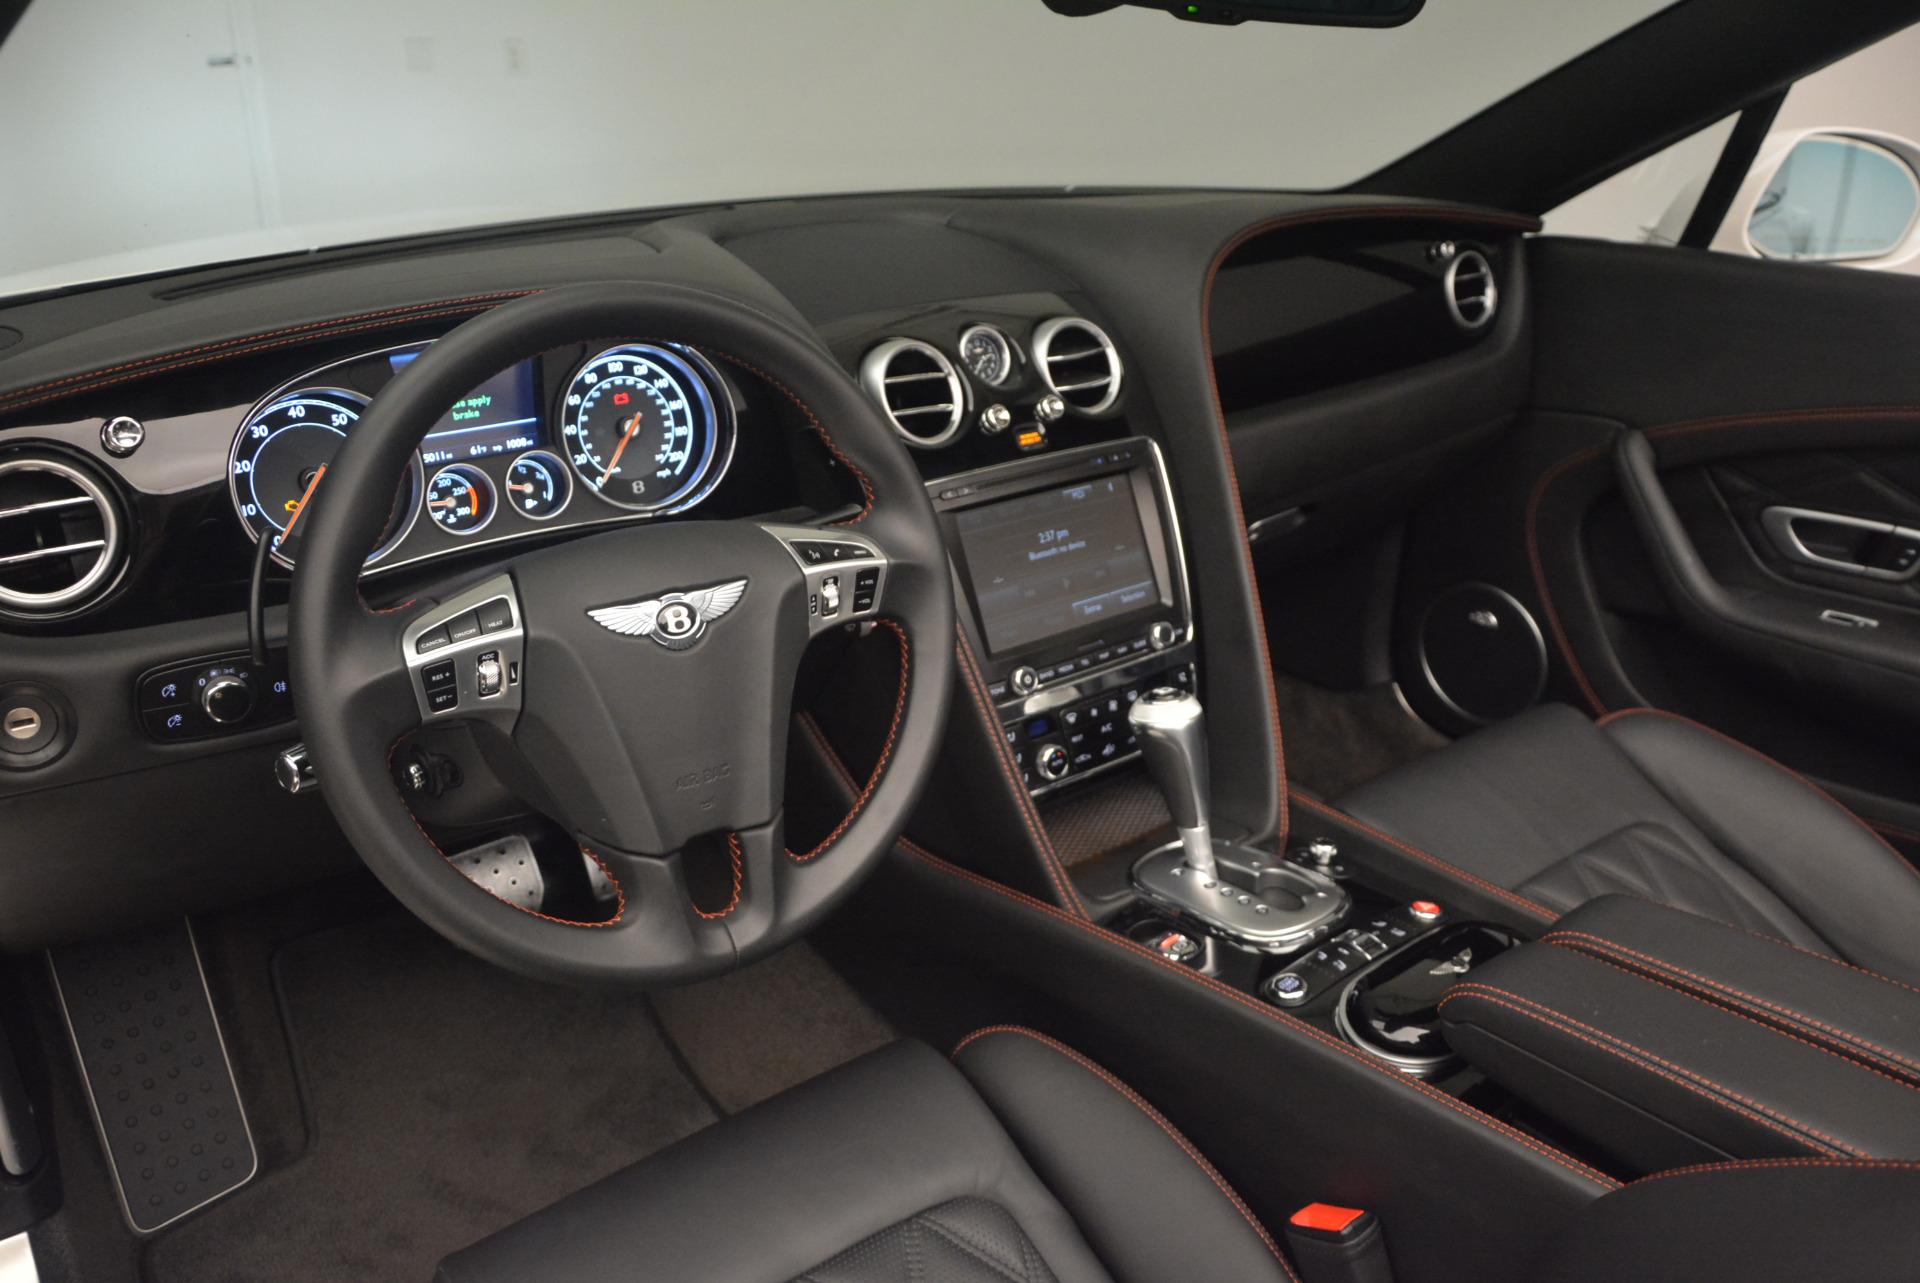 Used 2014 Bentley Continental GT Speed For Sale In Westport, CT 1129_p31